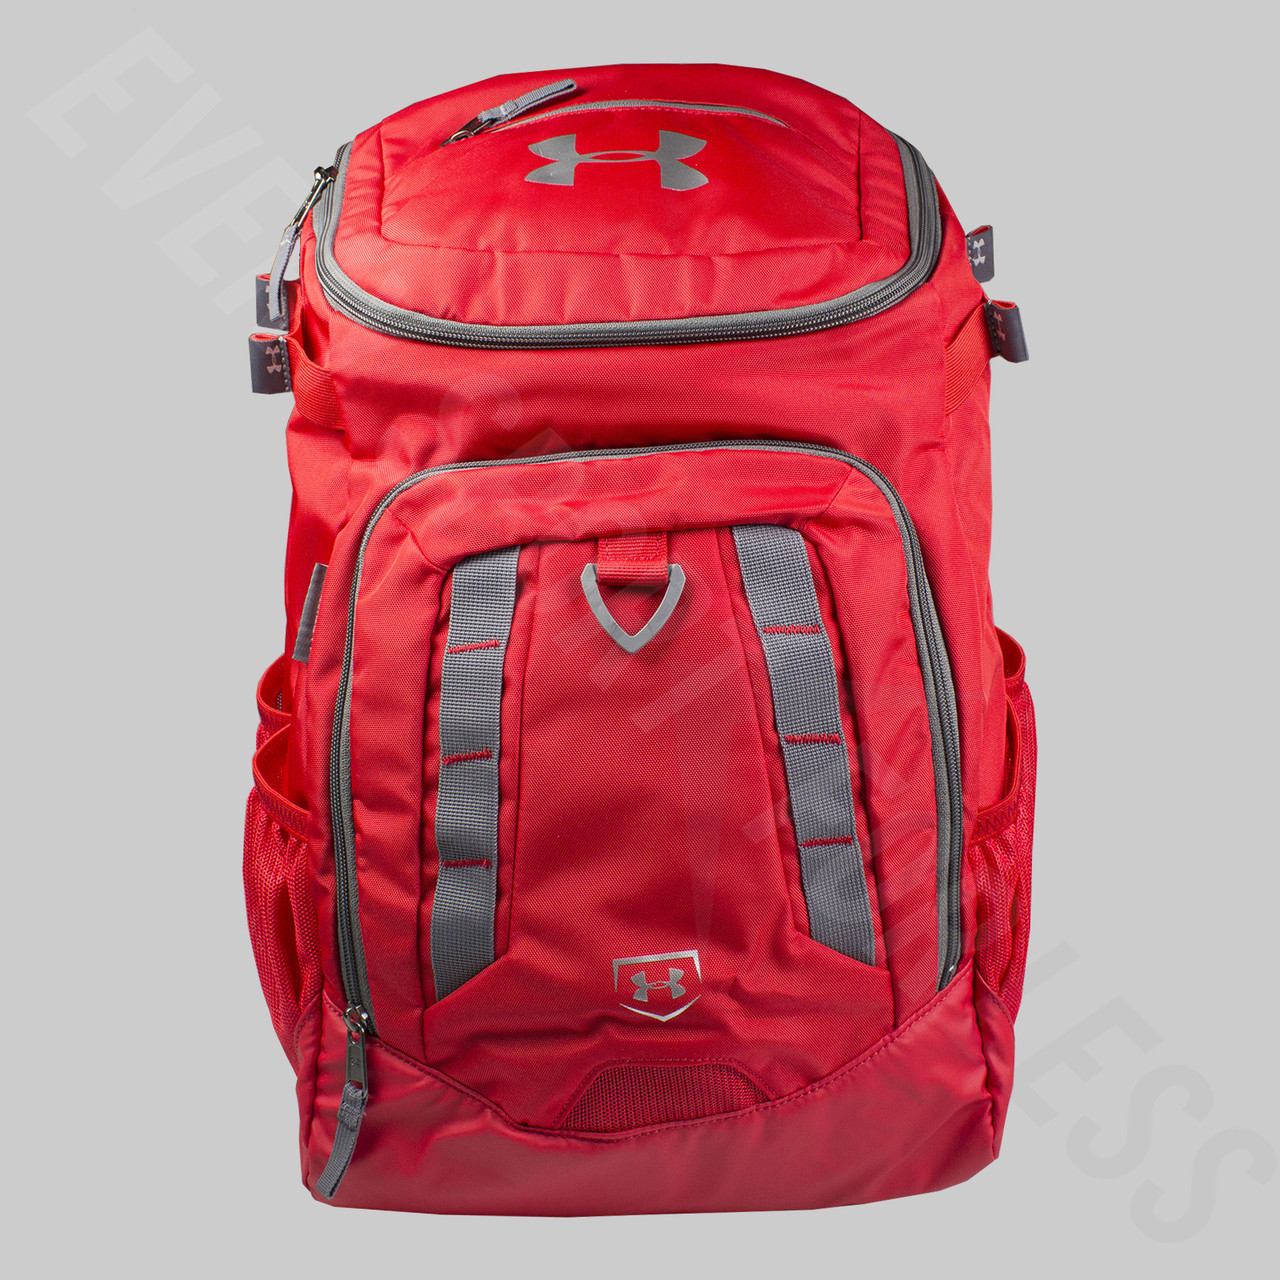 623ac01a99 ... Under Armour Undeniable Baseball   Softball Bat Backpack ...